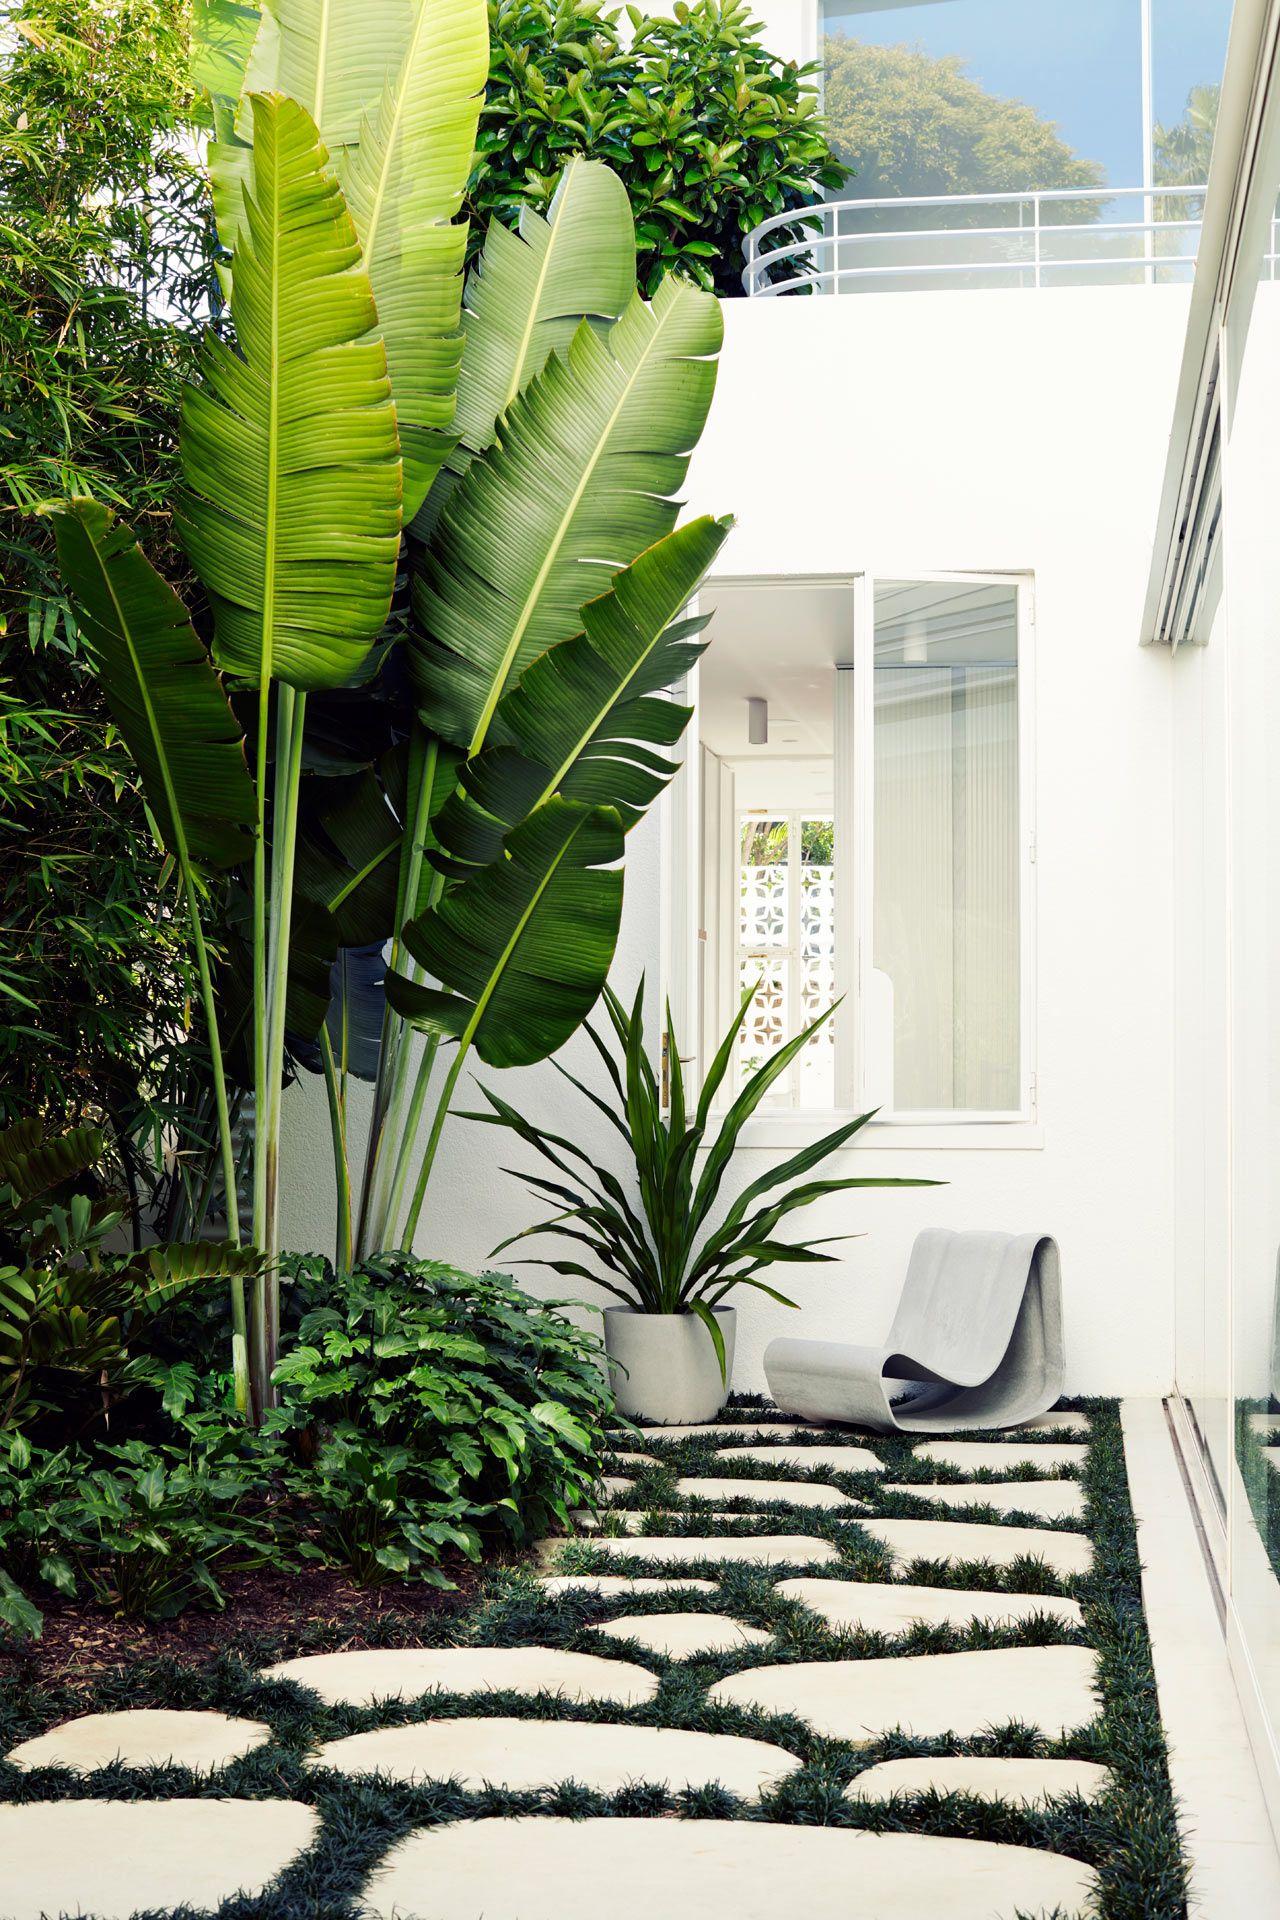 Sculptural Outdoor Furniture and Accessories by Swisspearl #garden